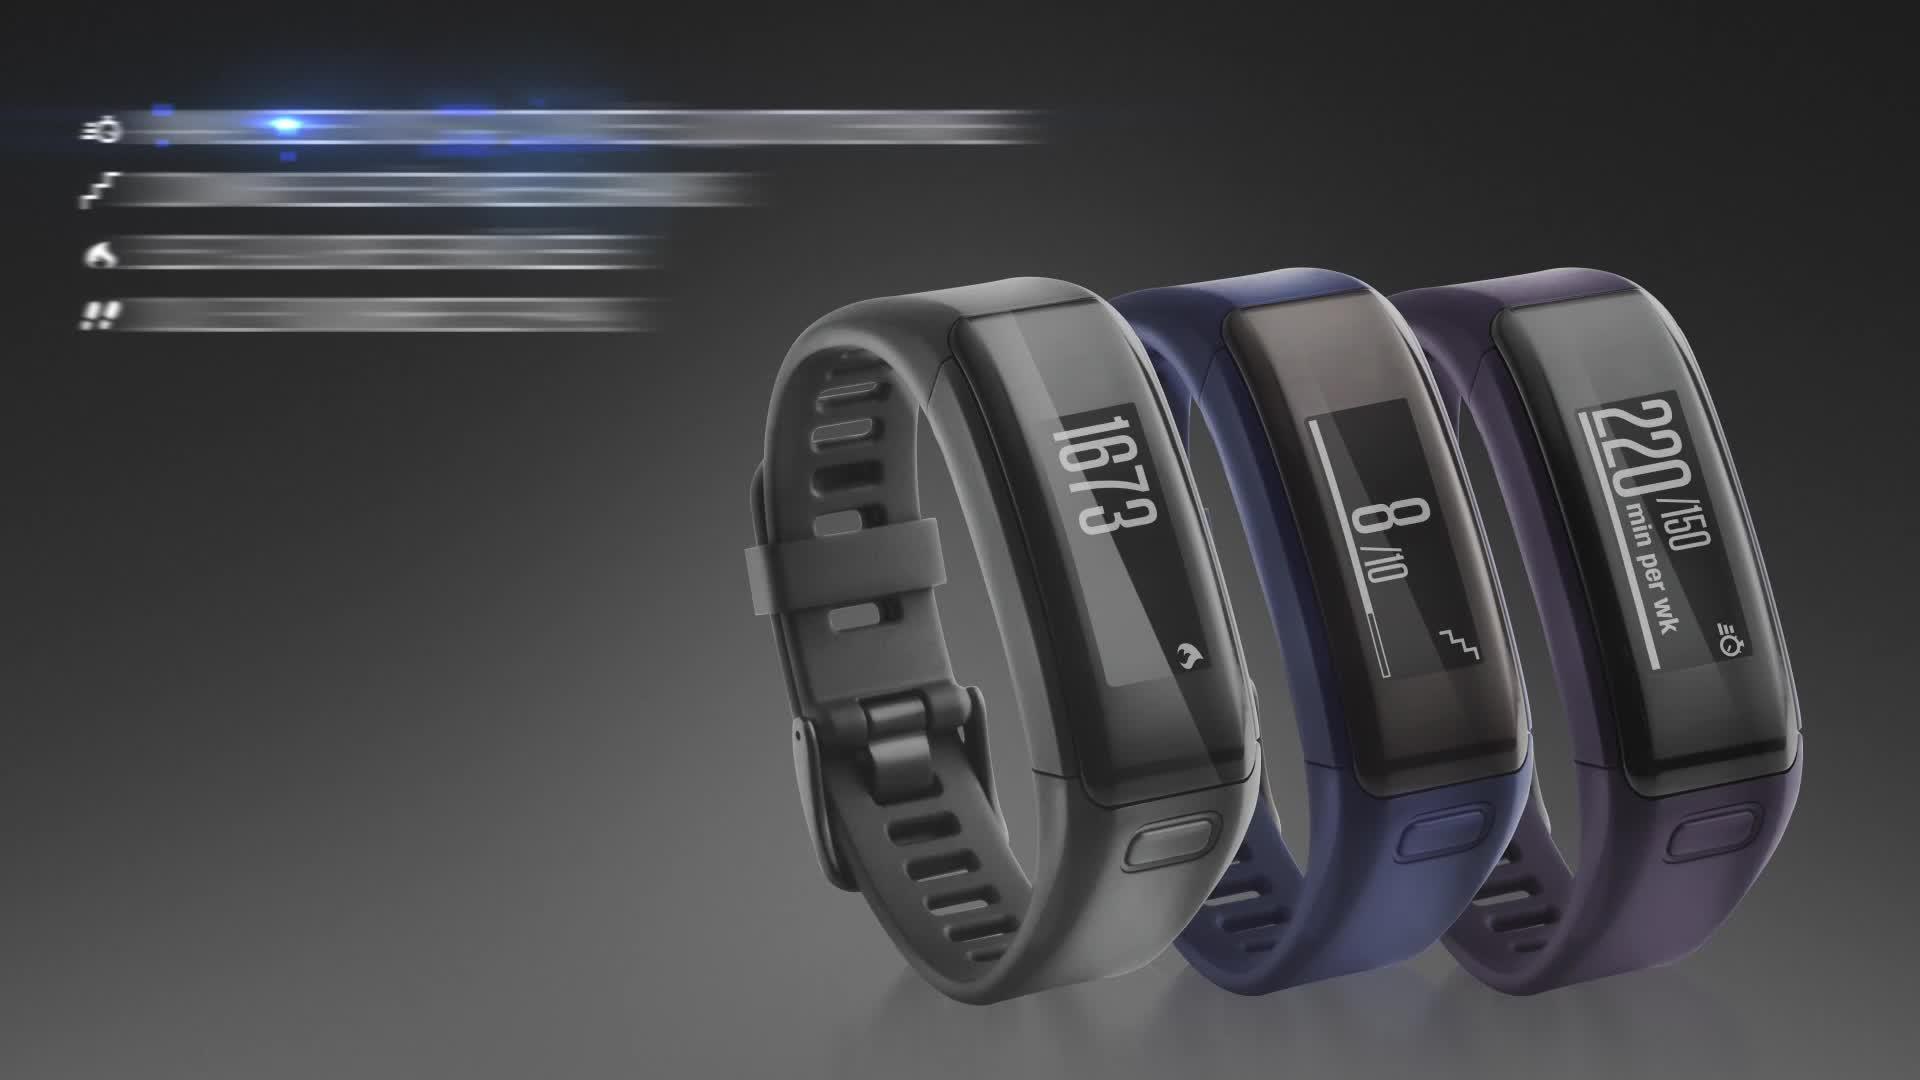 Bracelet connecté Garmin Vivosmart HR taille regular ...